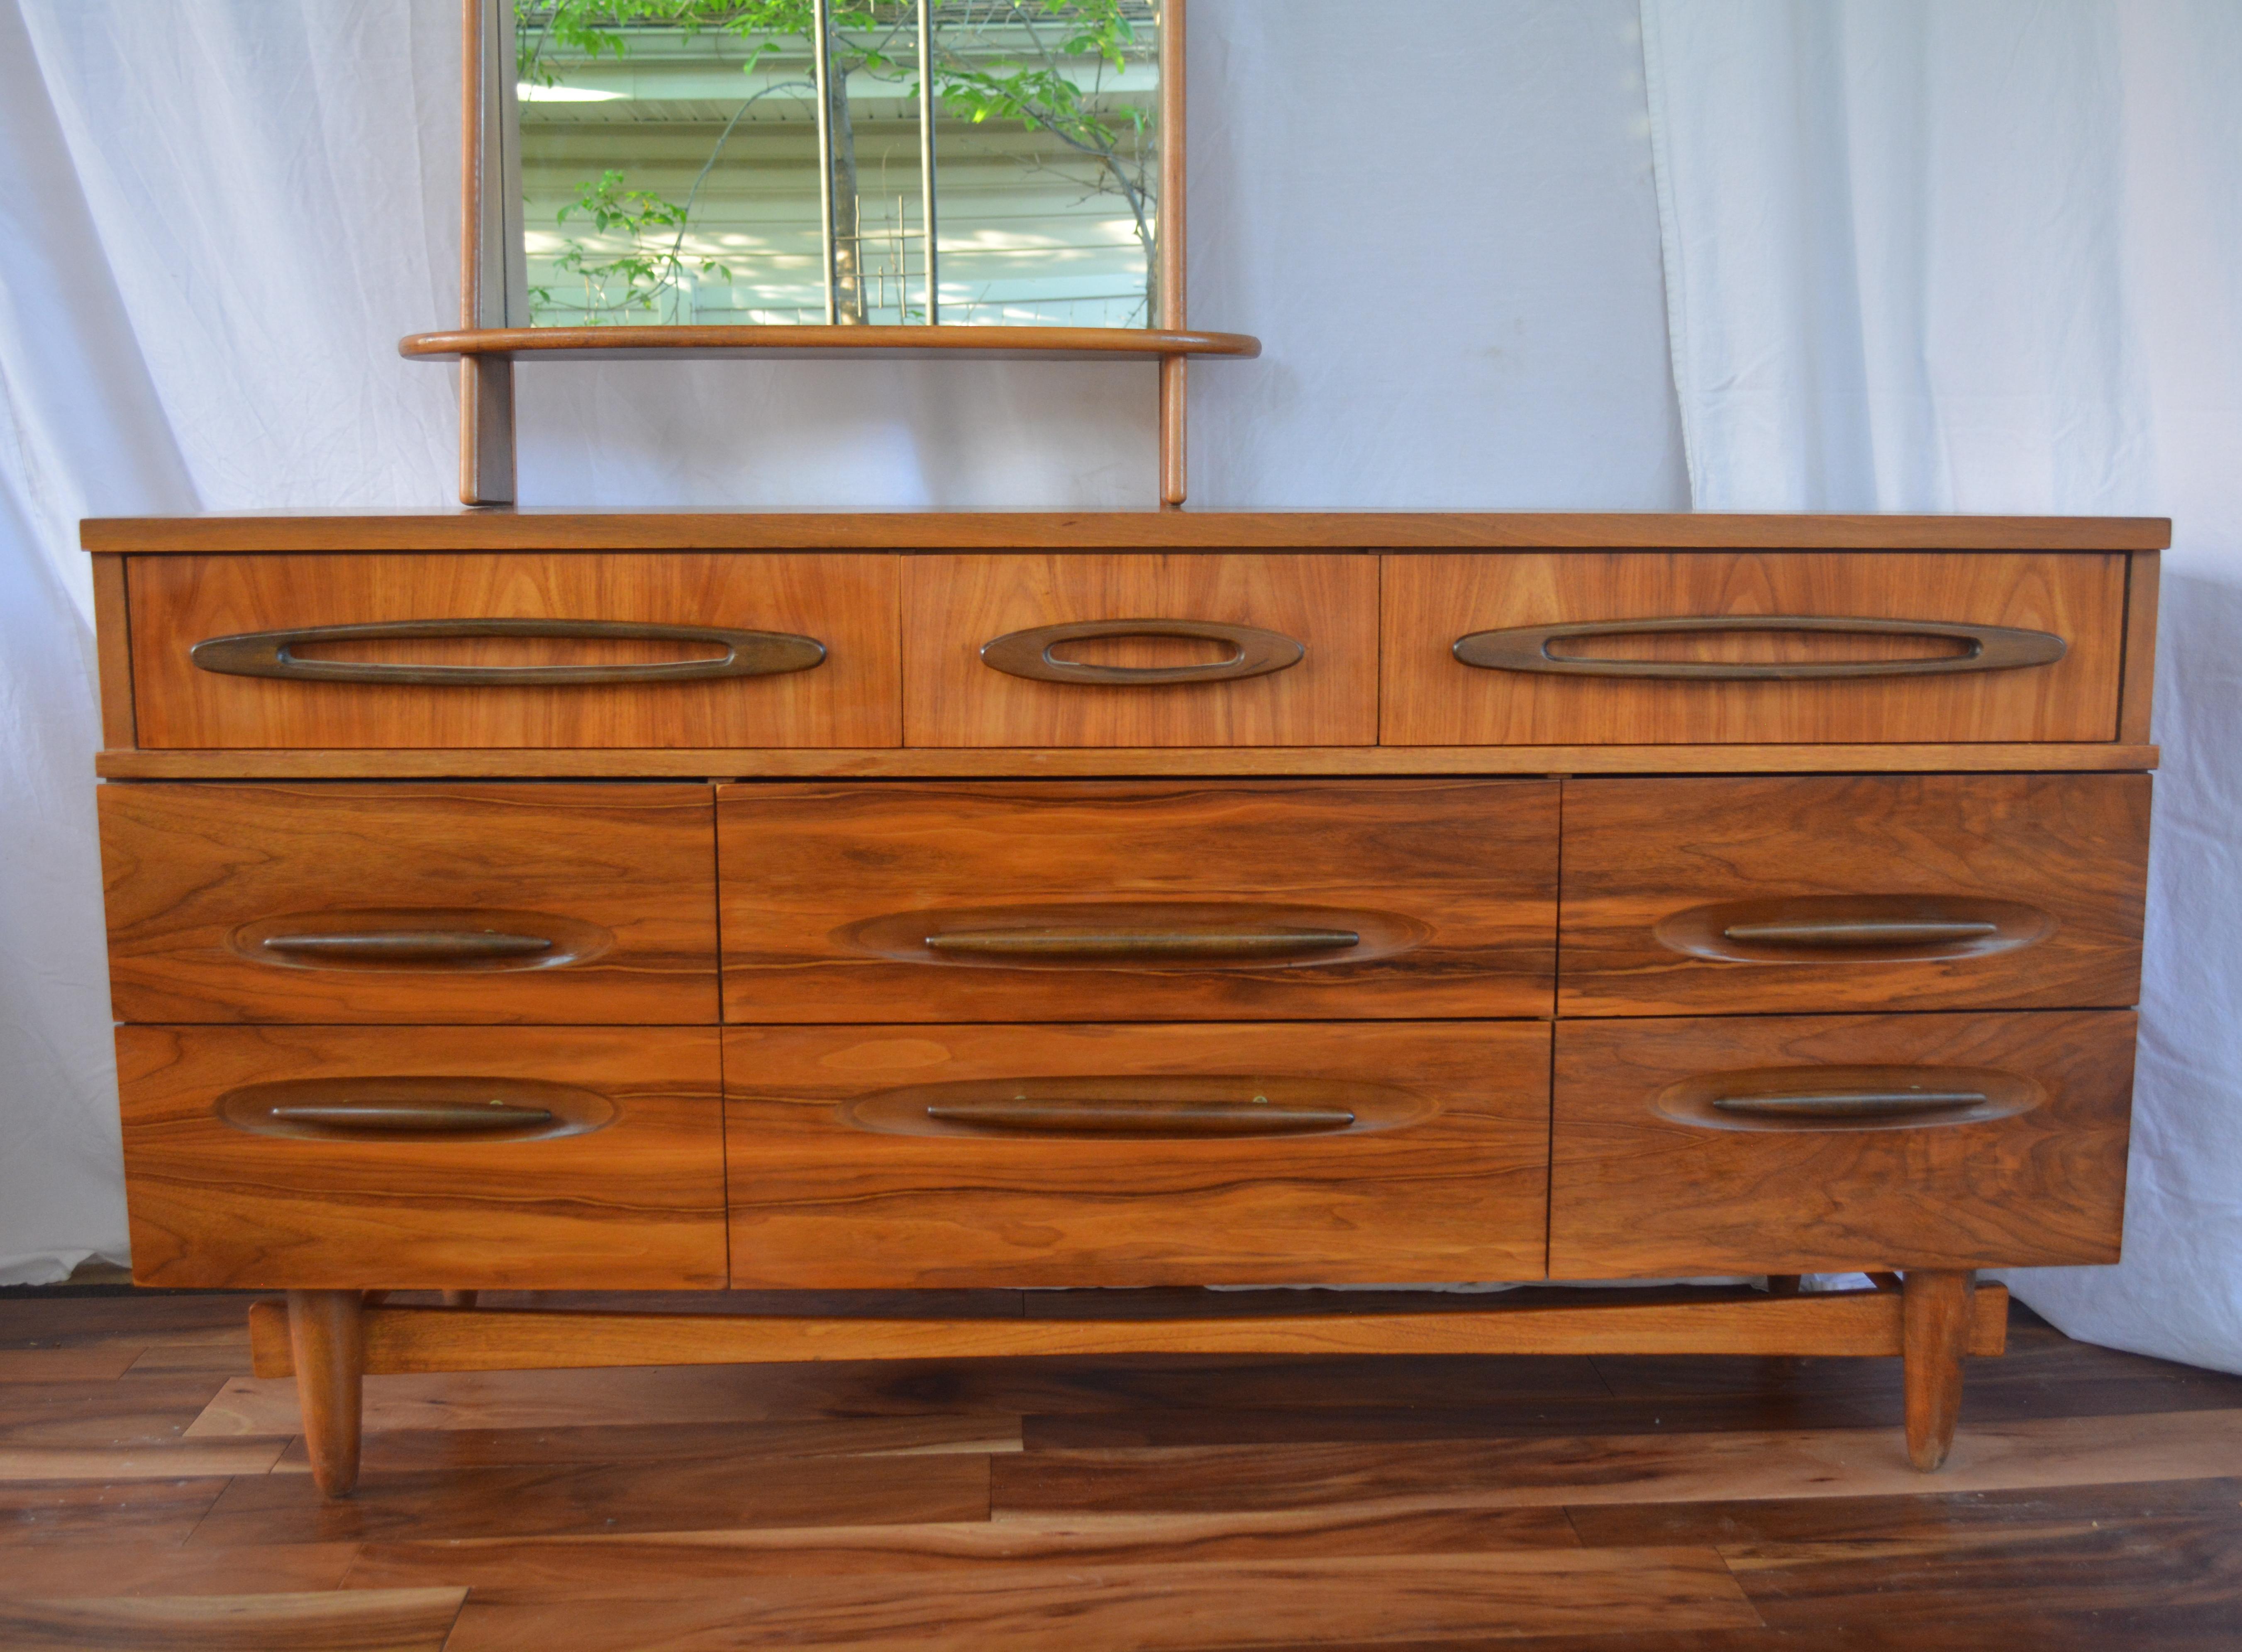 Genial Ward Furniture Mfg Co Mid Century Modern 9 Drawer Dresser   Image 3 Of 9